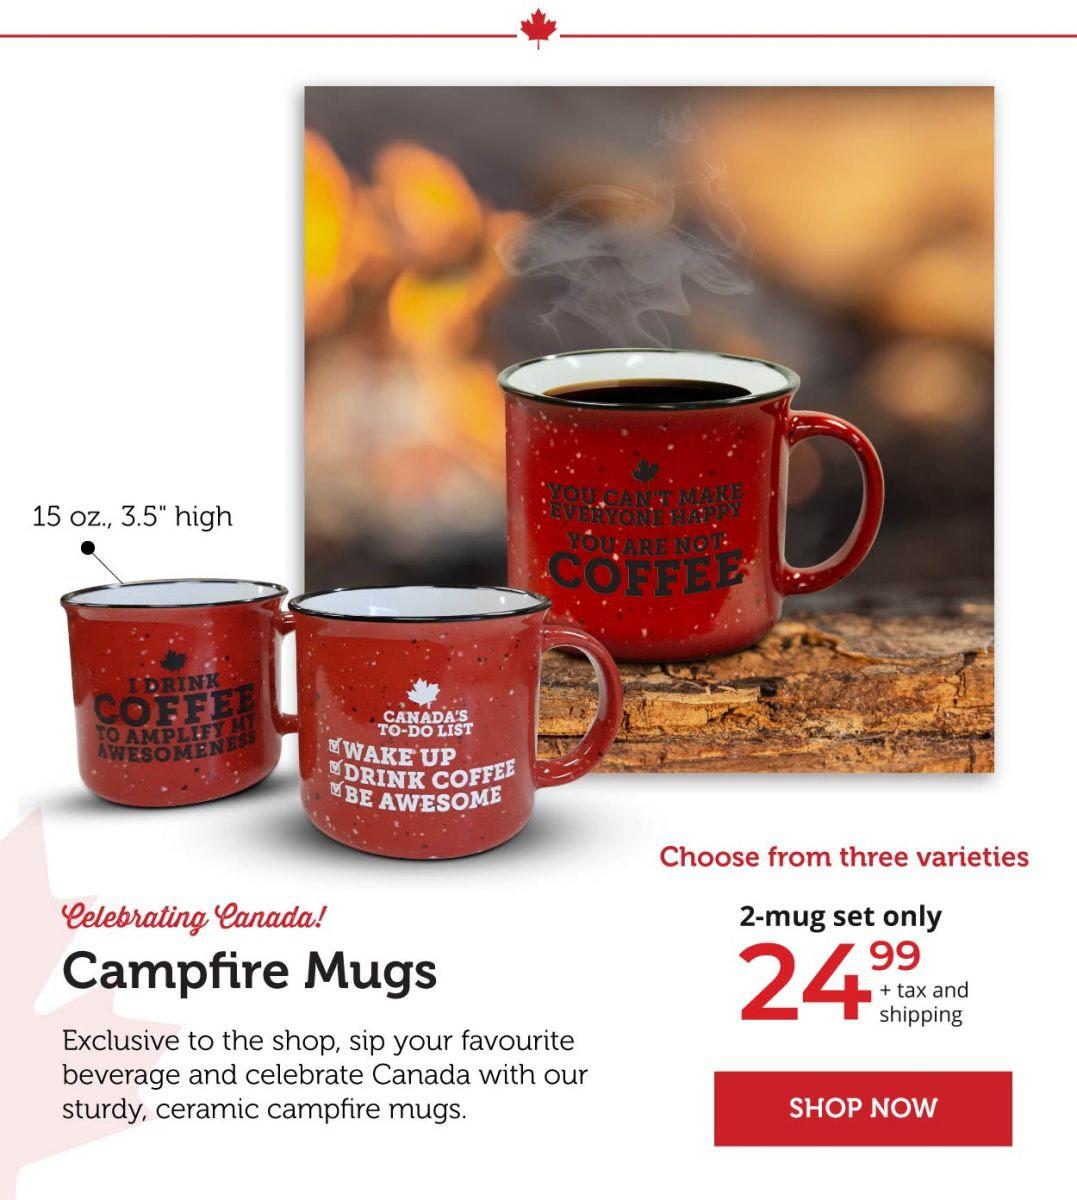 Campfire Mugs - Set of two